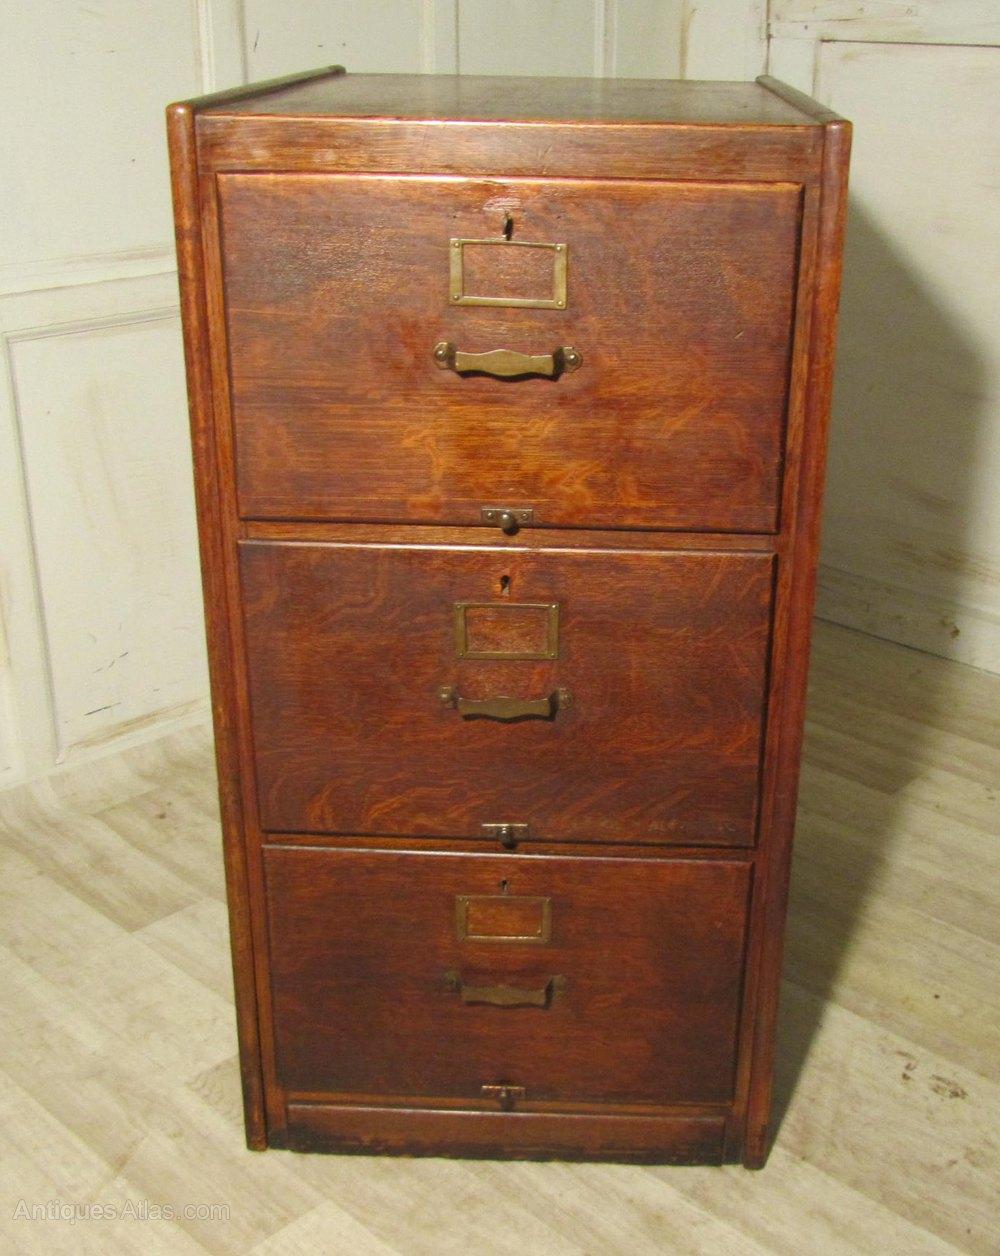 A Large Art Deco 3 Drawer Oak Filing Cabinet ... & A Large Art Deco 3 Drawer Oak Filing Cabinet - Antiques Atlas